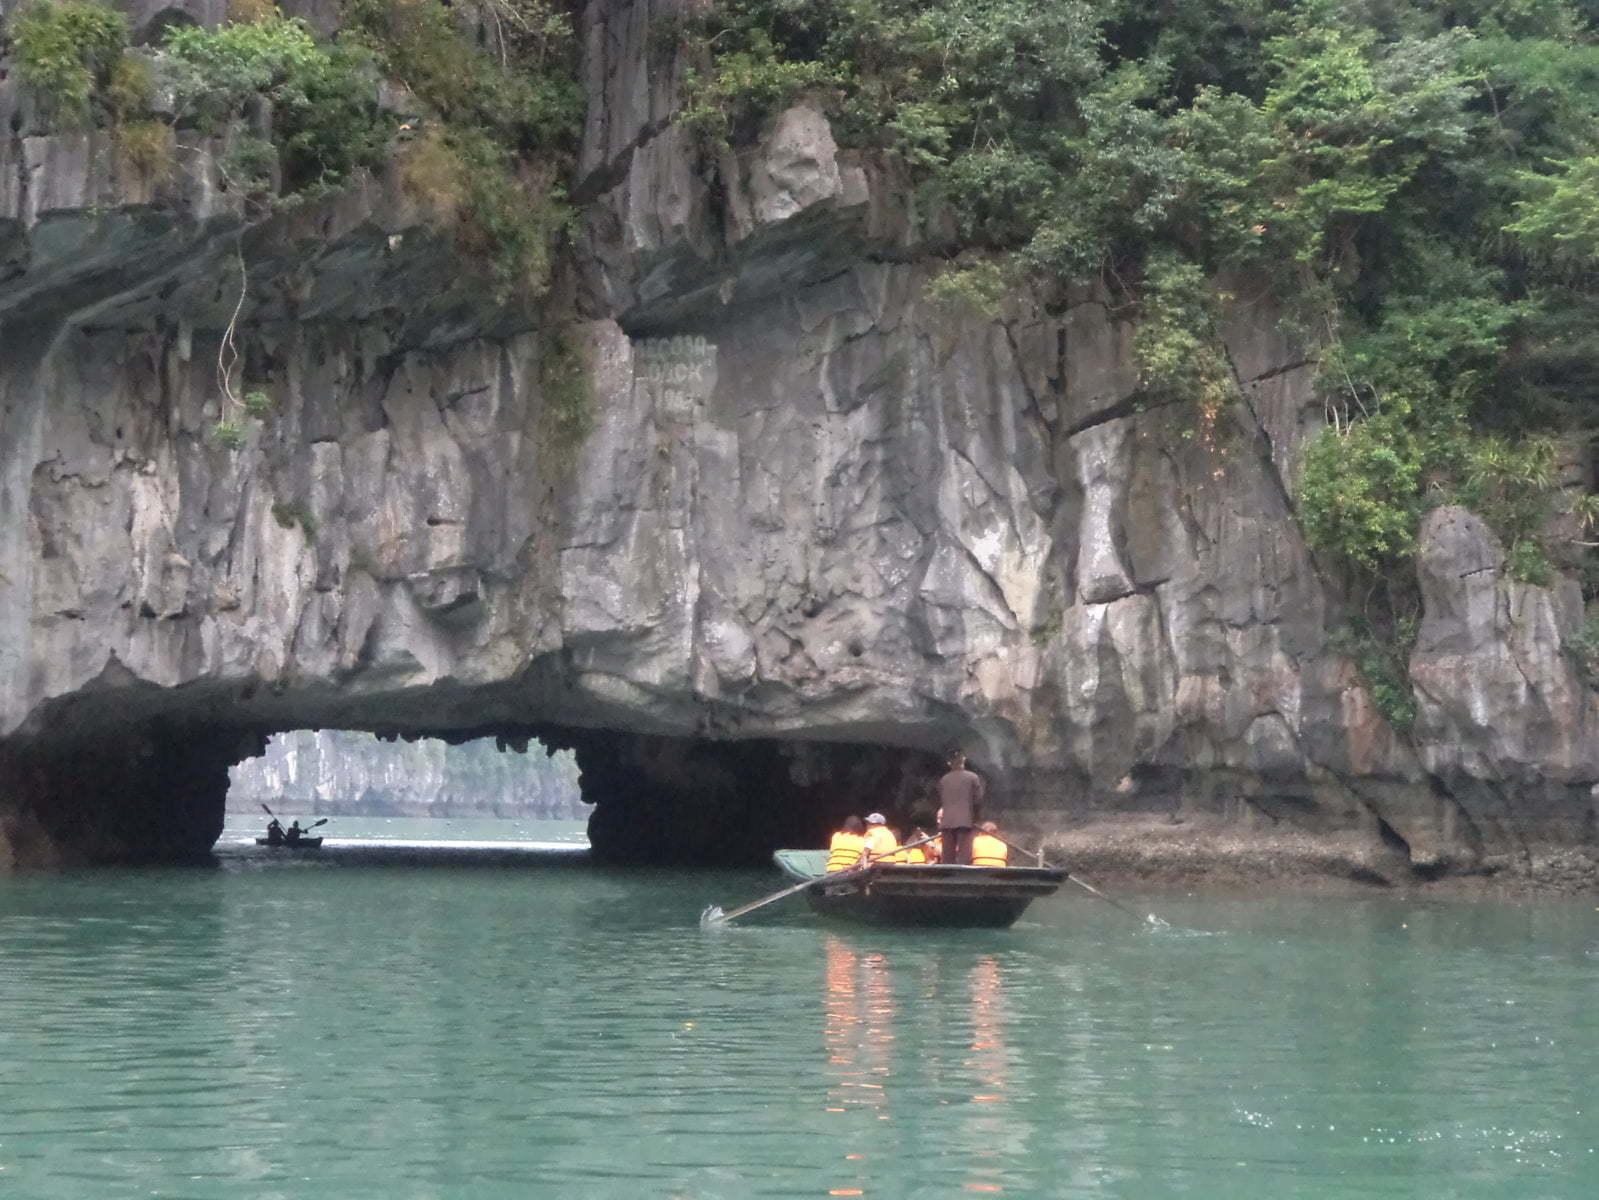 Caverna 2 em Hang Luon - Ha Long Bay, próximo a Hanoi, Vietnã